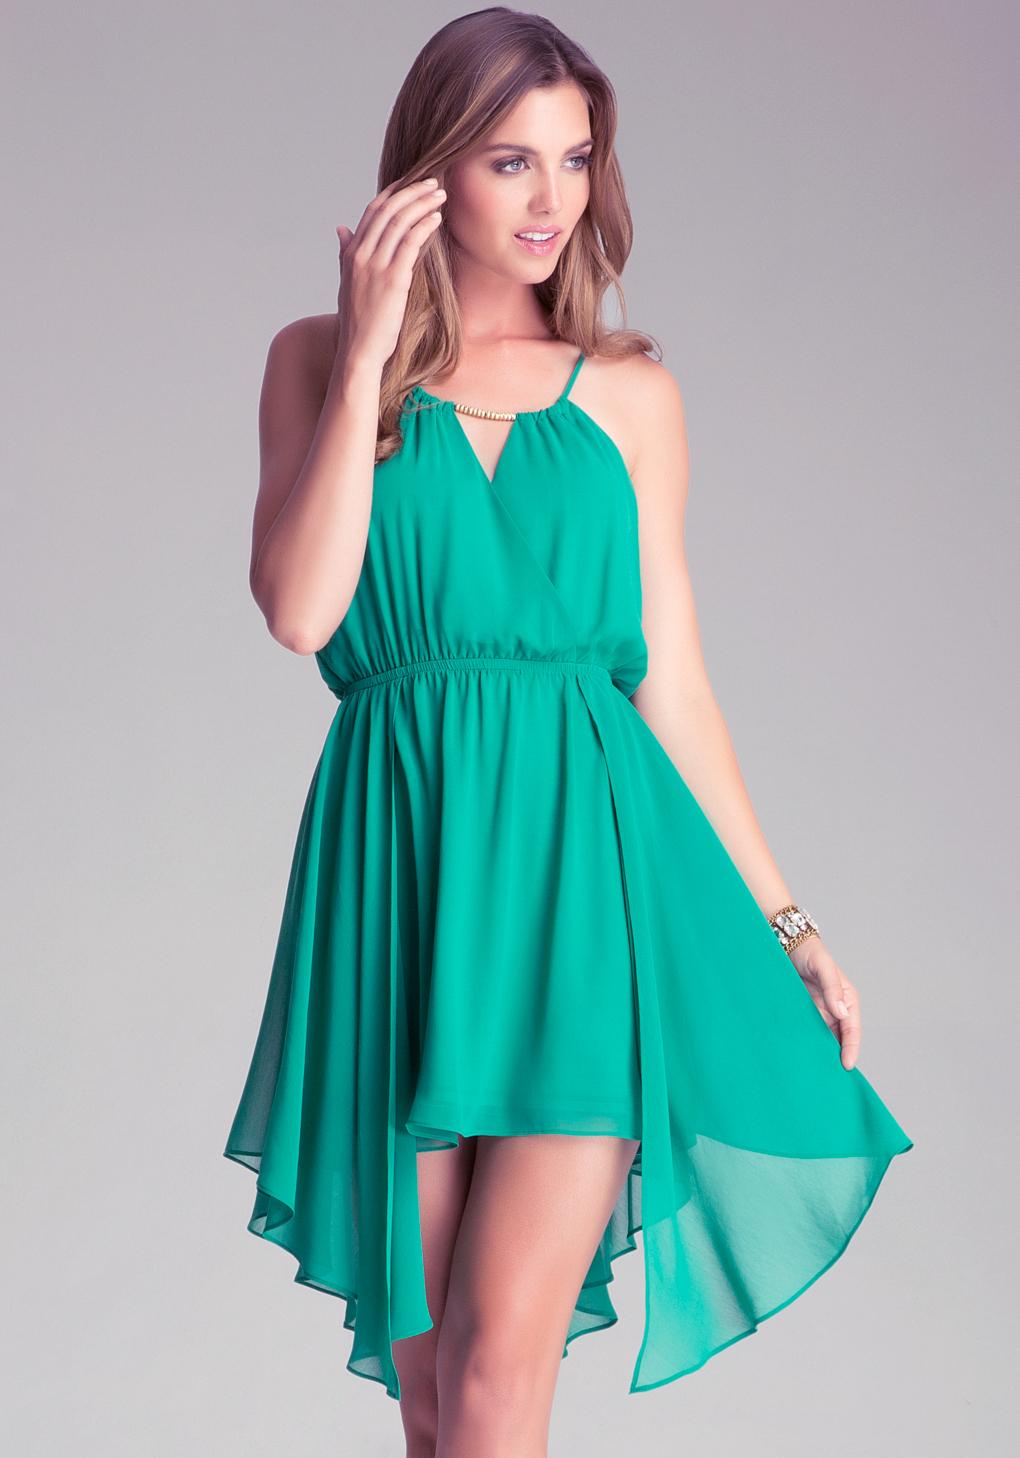 Lyst - Bebe Surplice Overlay Dress in Green